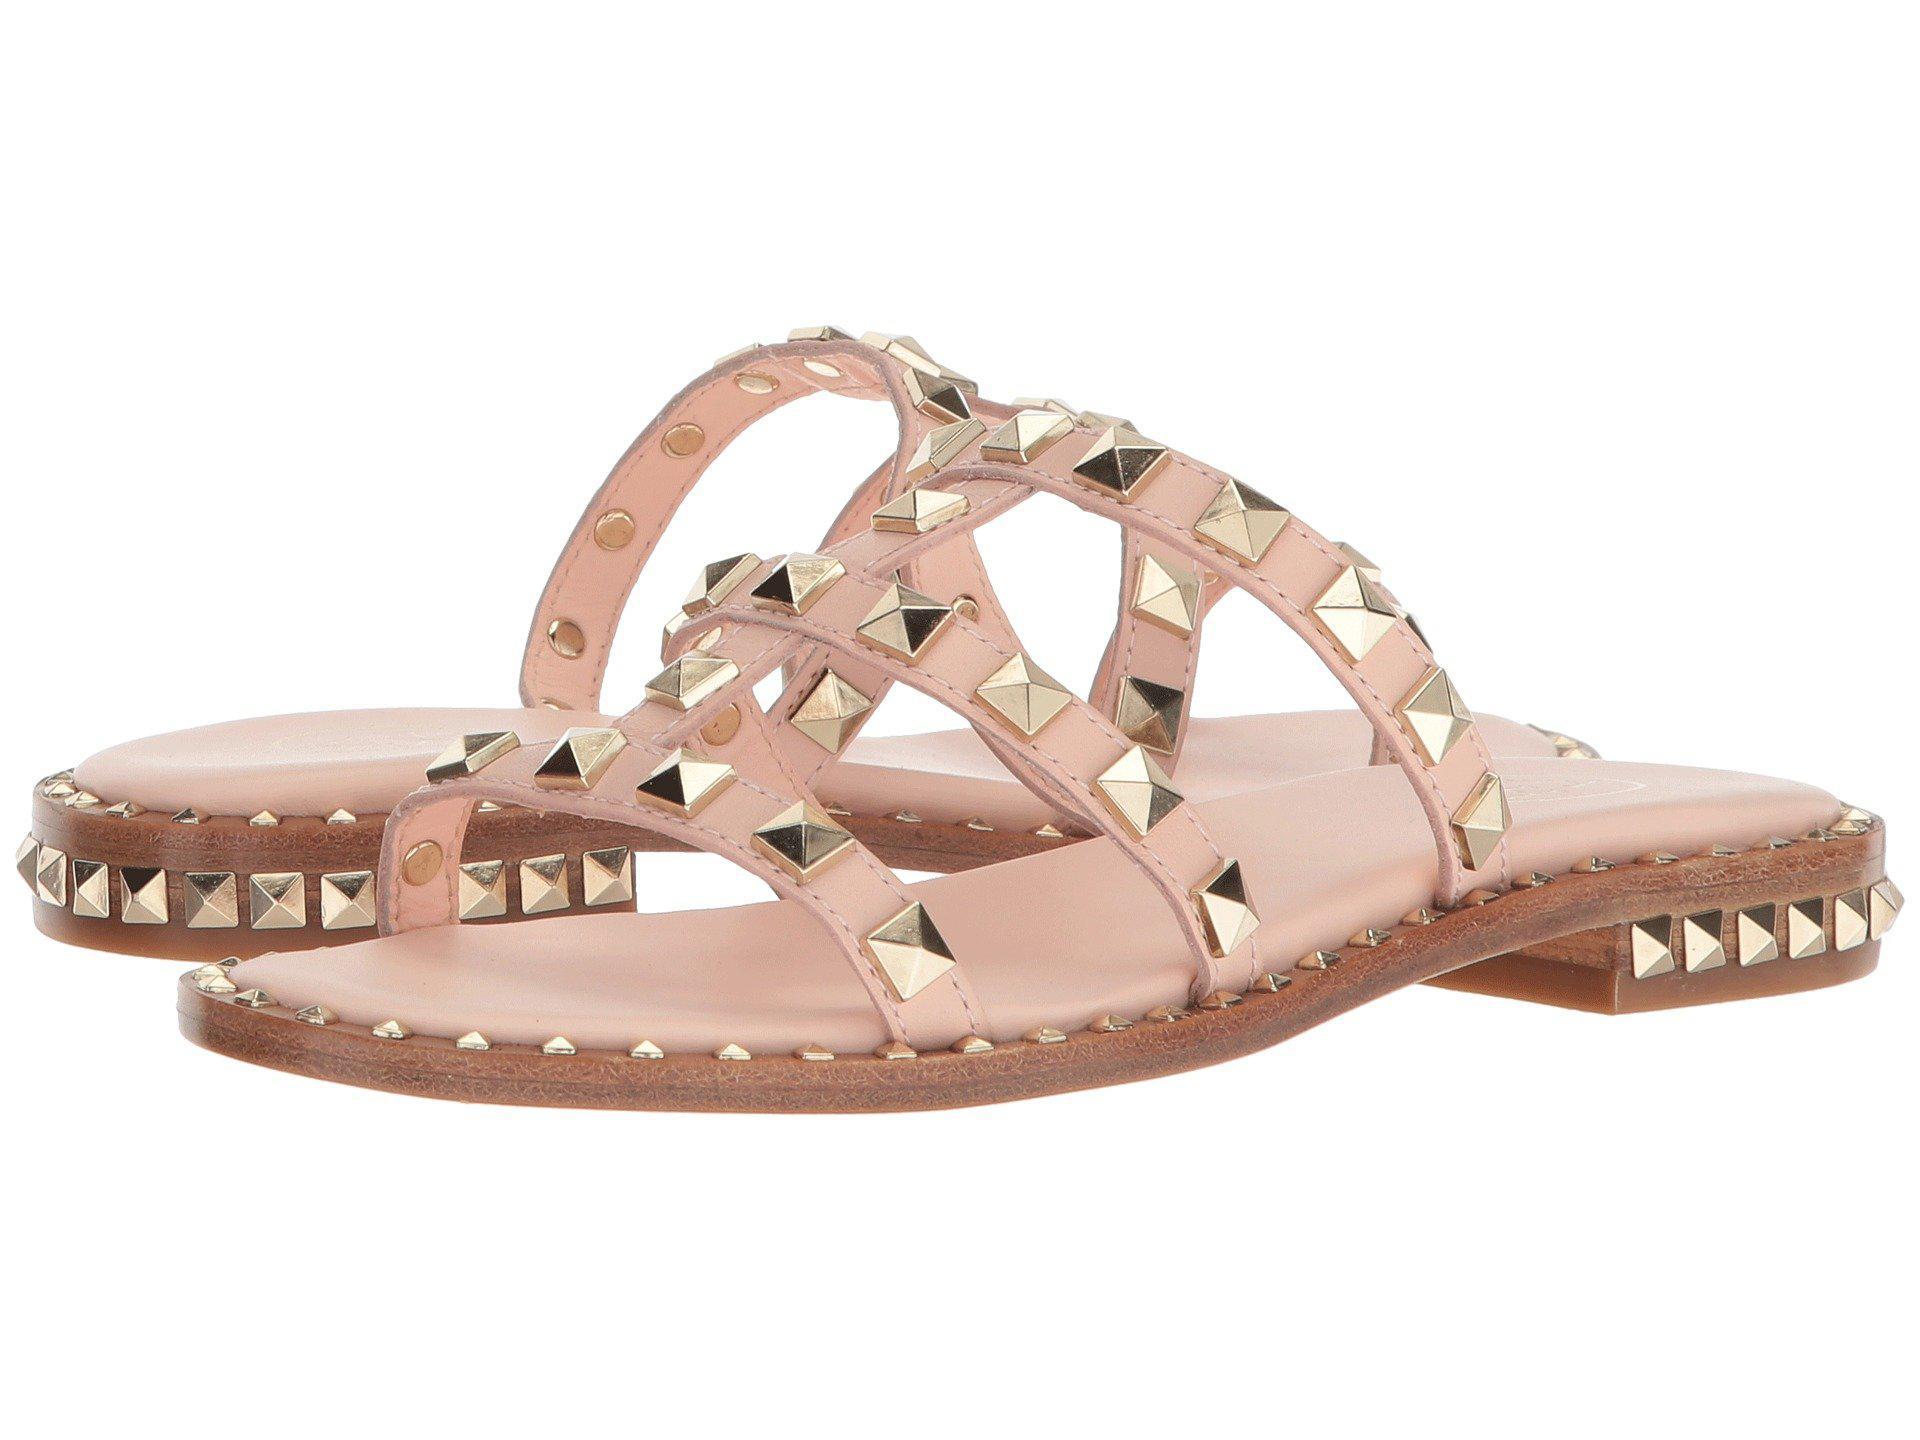 c2acc97e5a92 Lyst ash as pop slide sandal jpg 1920x1440 Pop sandals